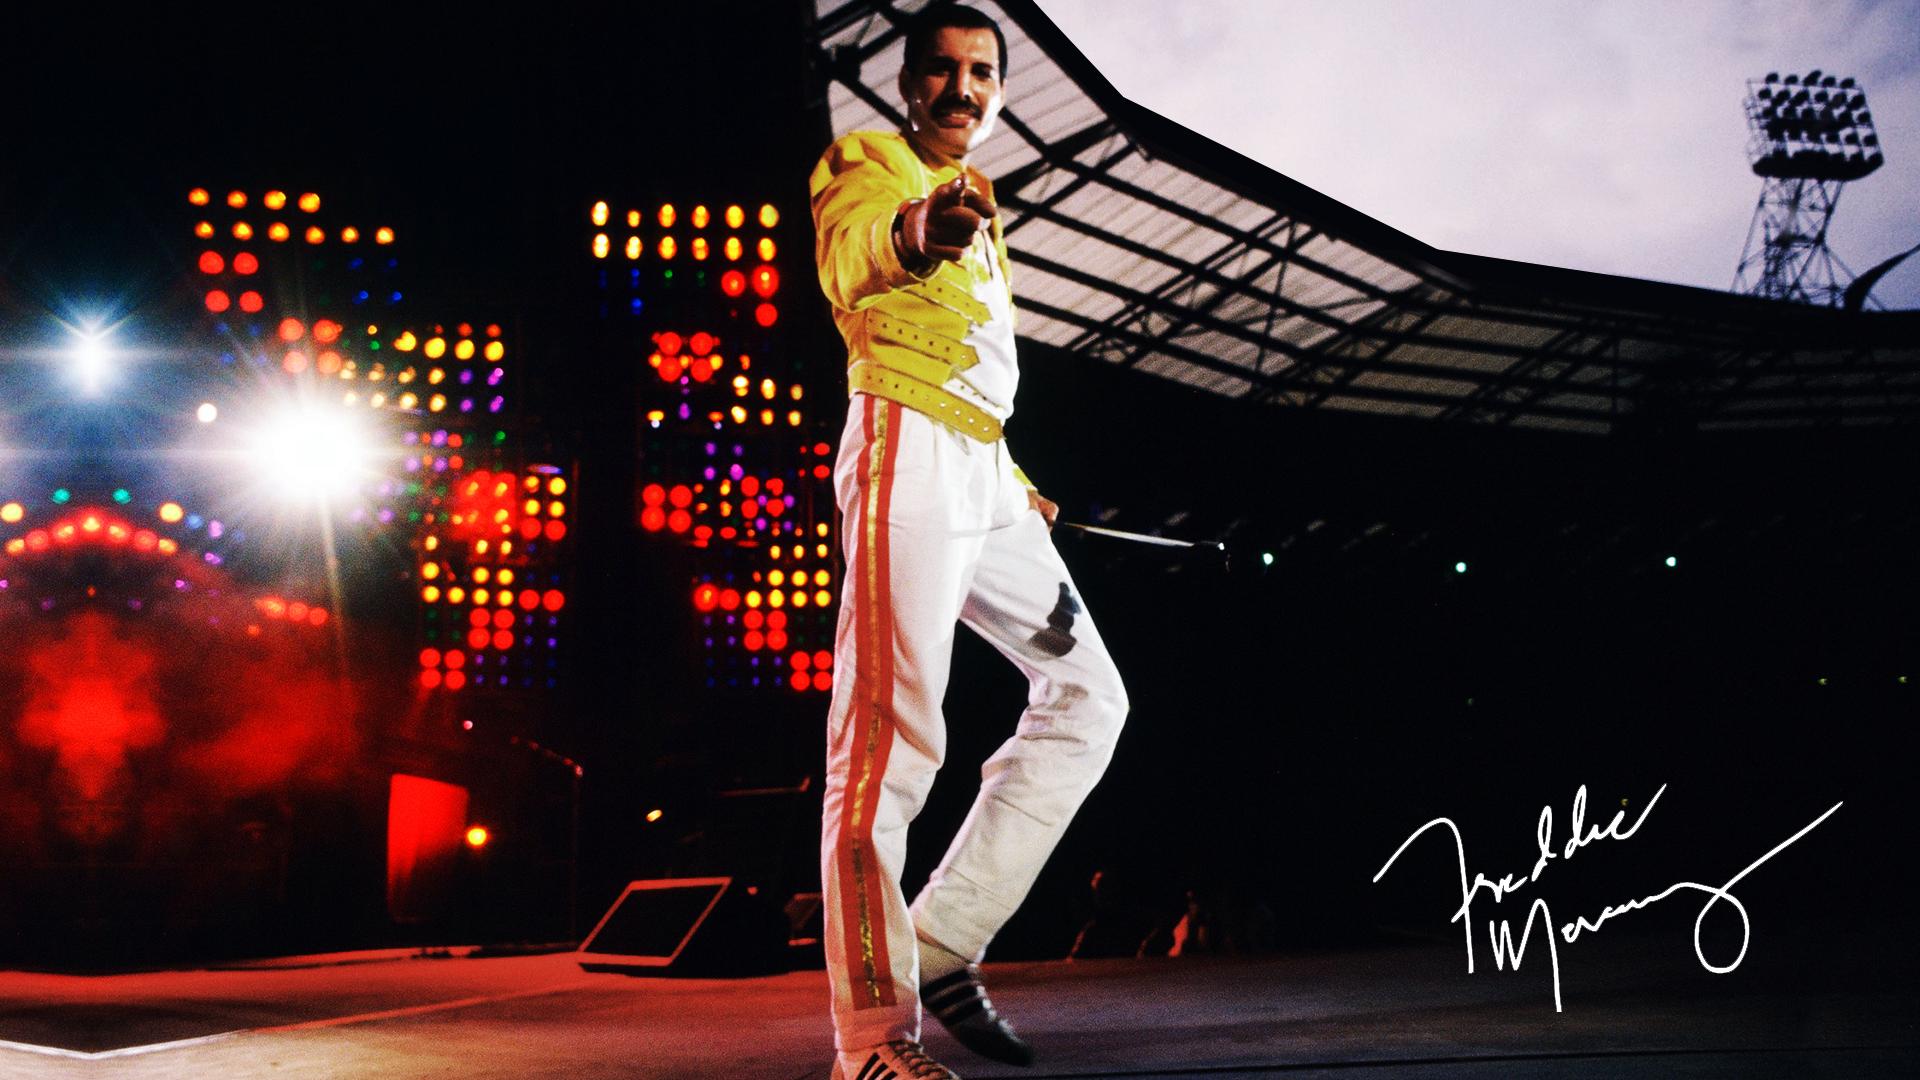 Nombran asteroide en honor a Freddie Mercury